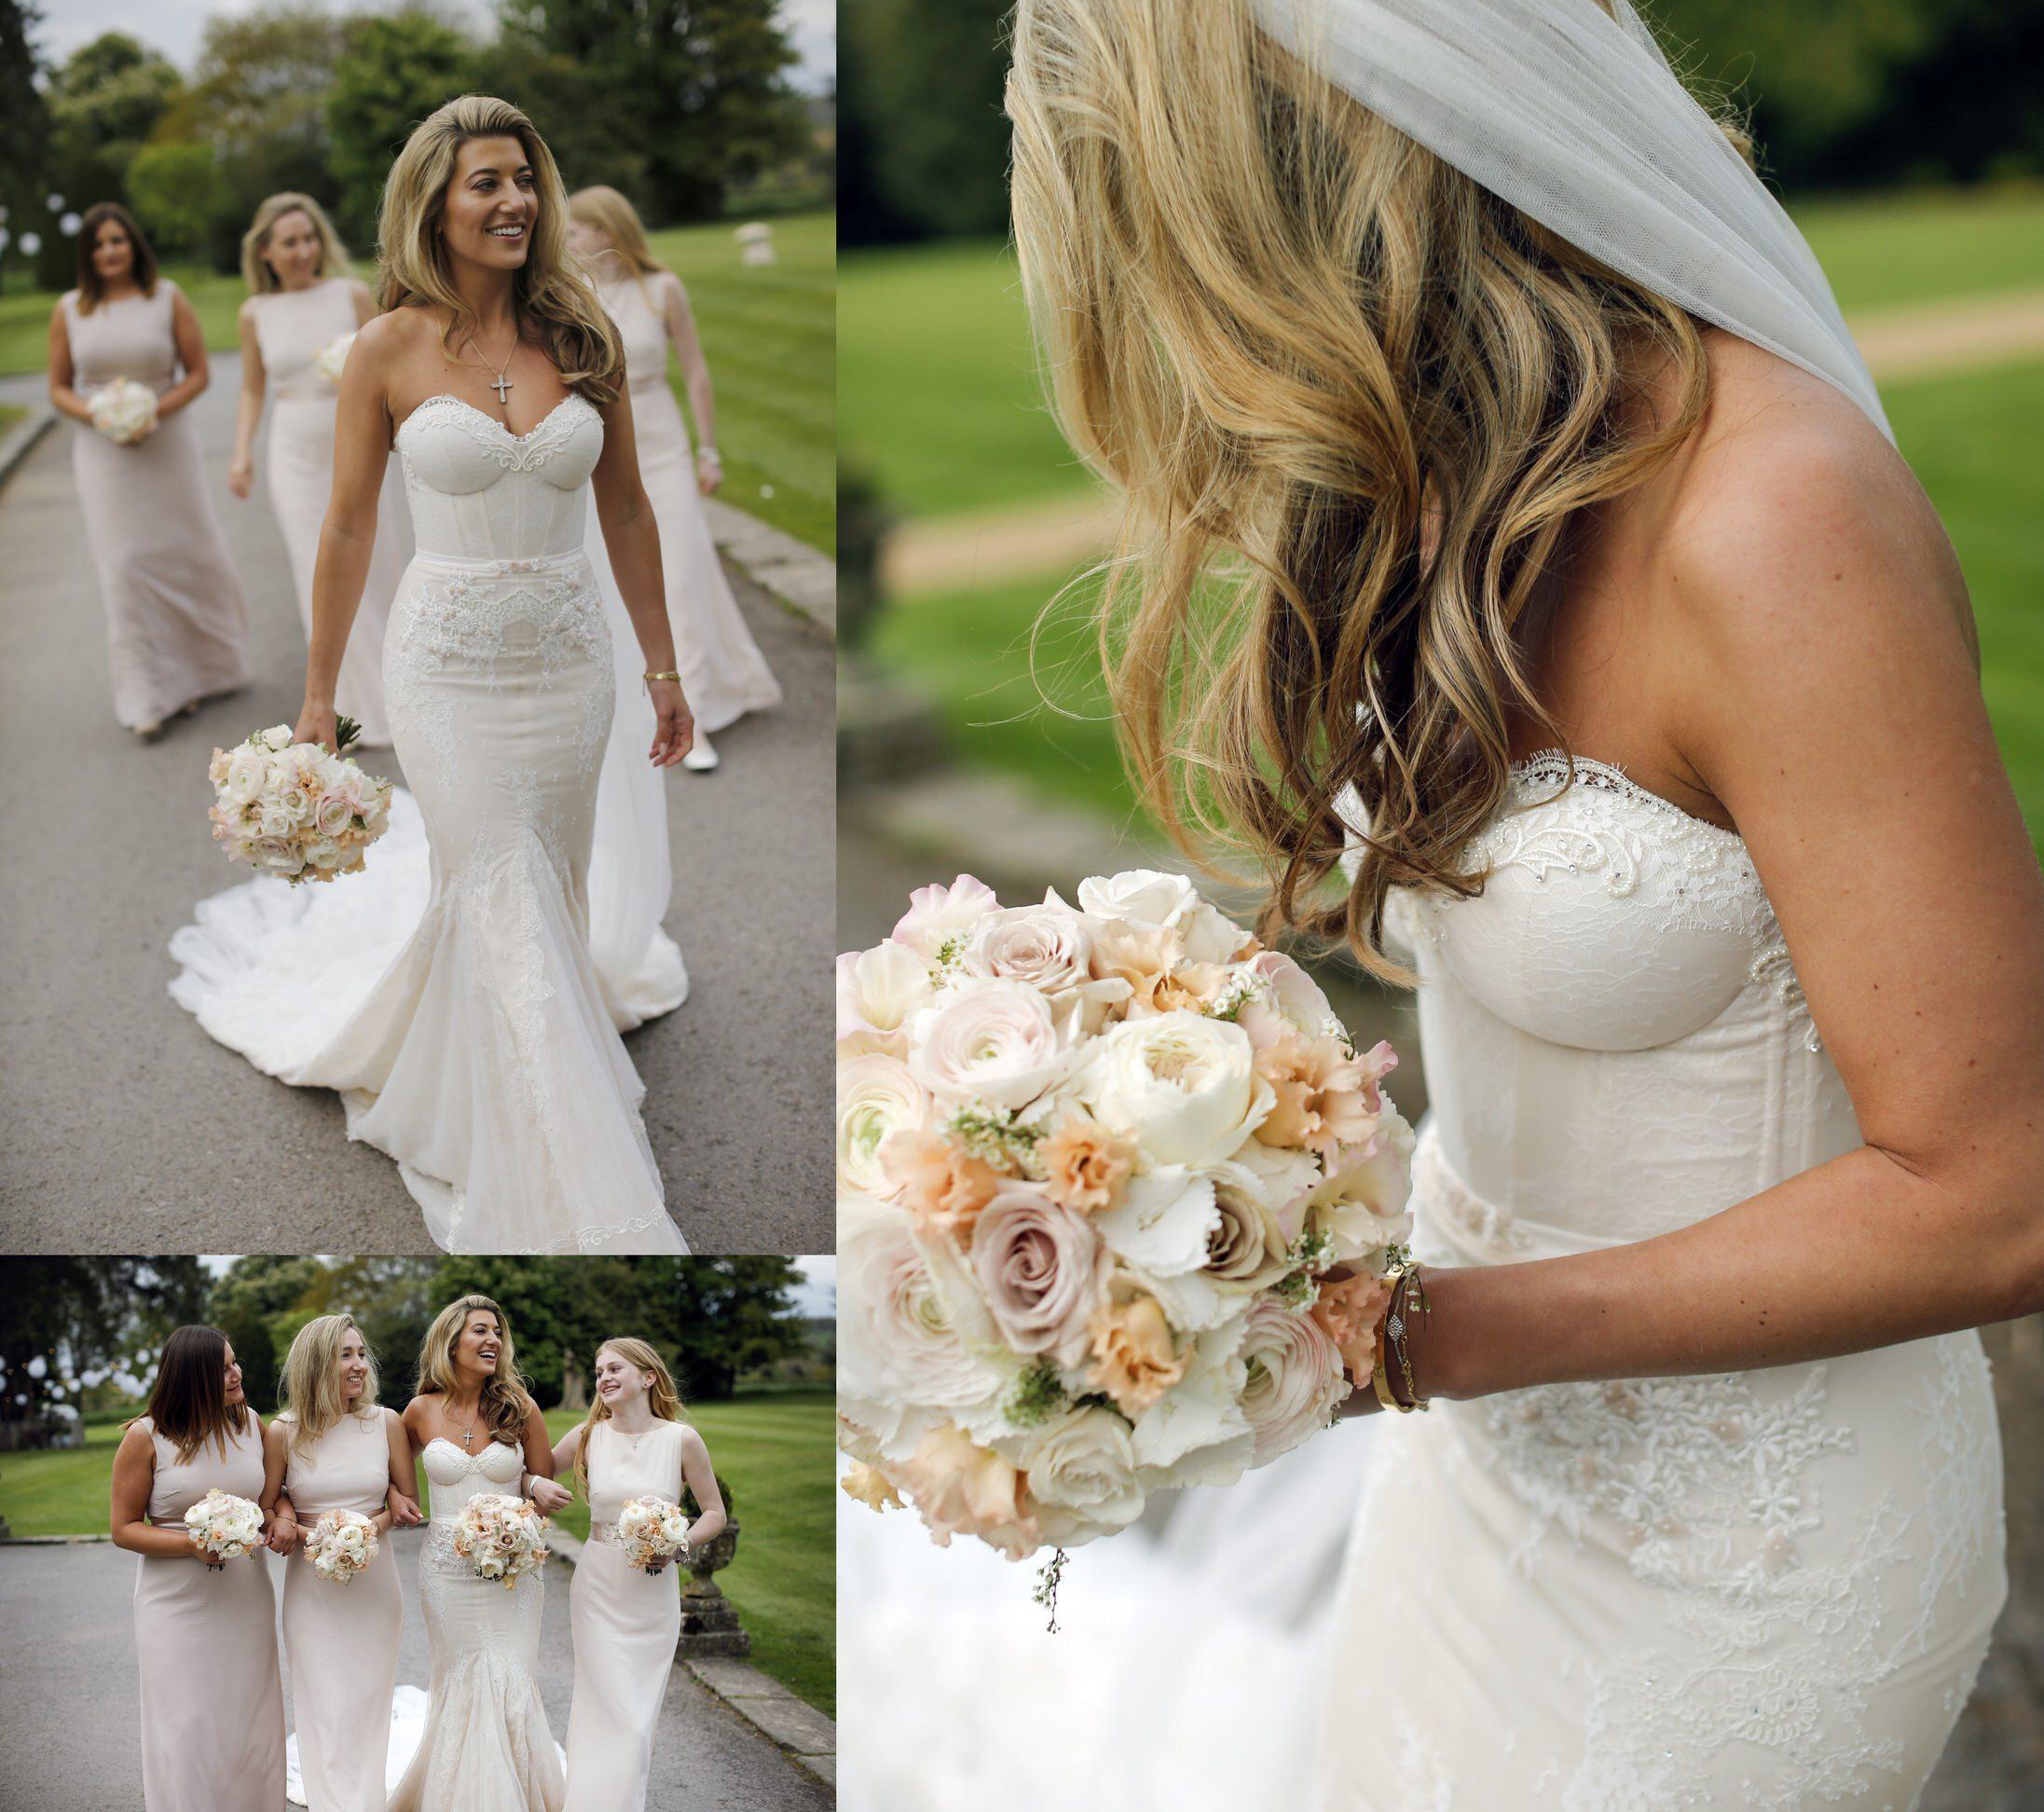 babington-house-wedding-at-soho-house-london-wedding-photographer_0013.jpg